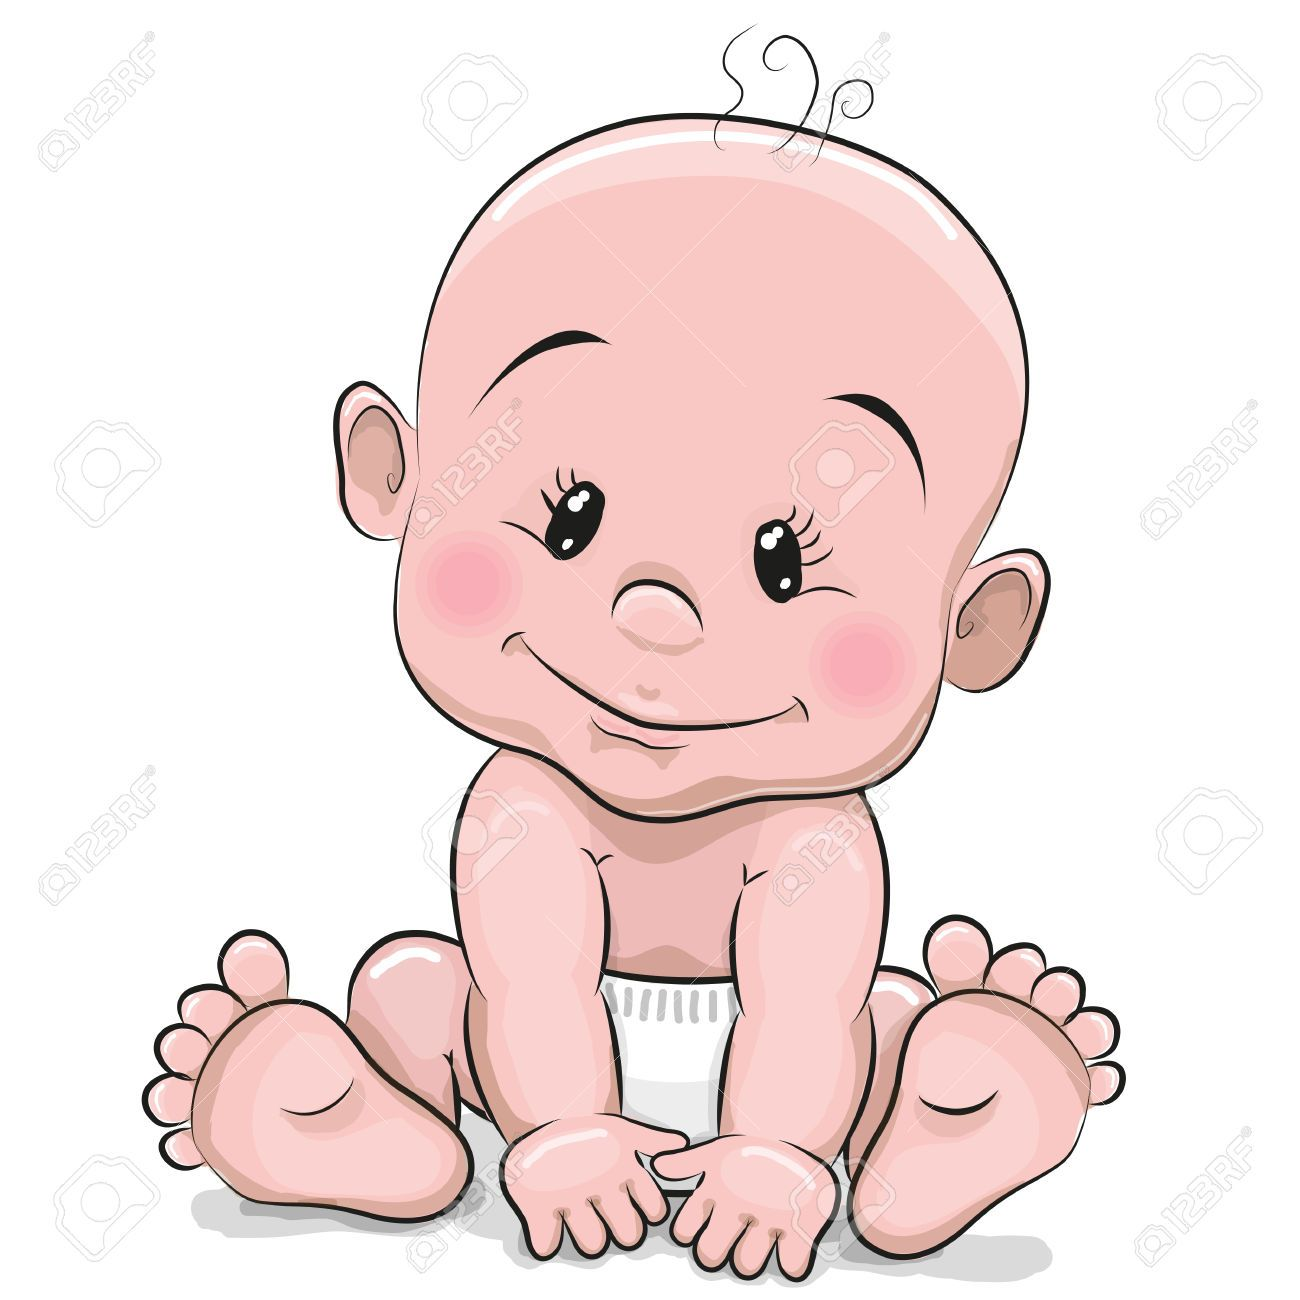 Diaper clipart cartoon little girl.  baby stock vector